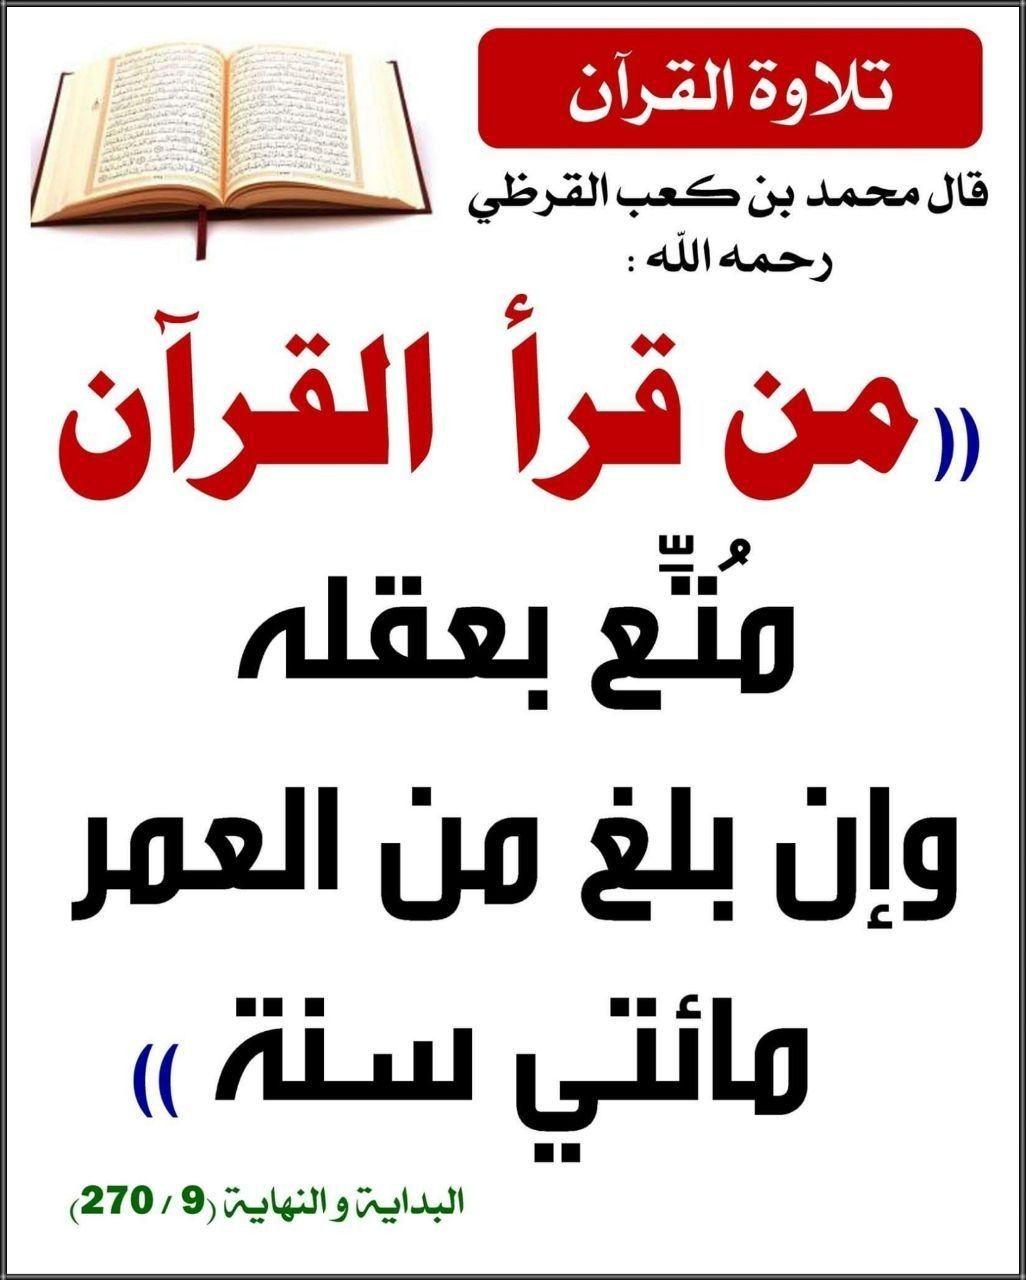 Pin By ام ماريا On اقوال الصحابة والائمة والعلماء Islamic Phrases Learn Islam Islamic Quotes